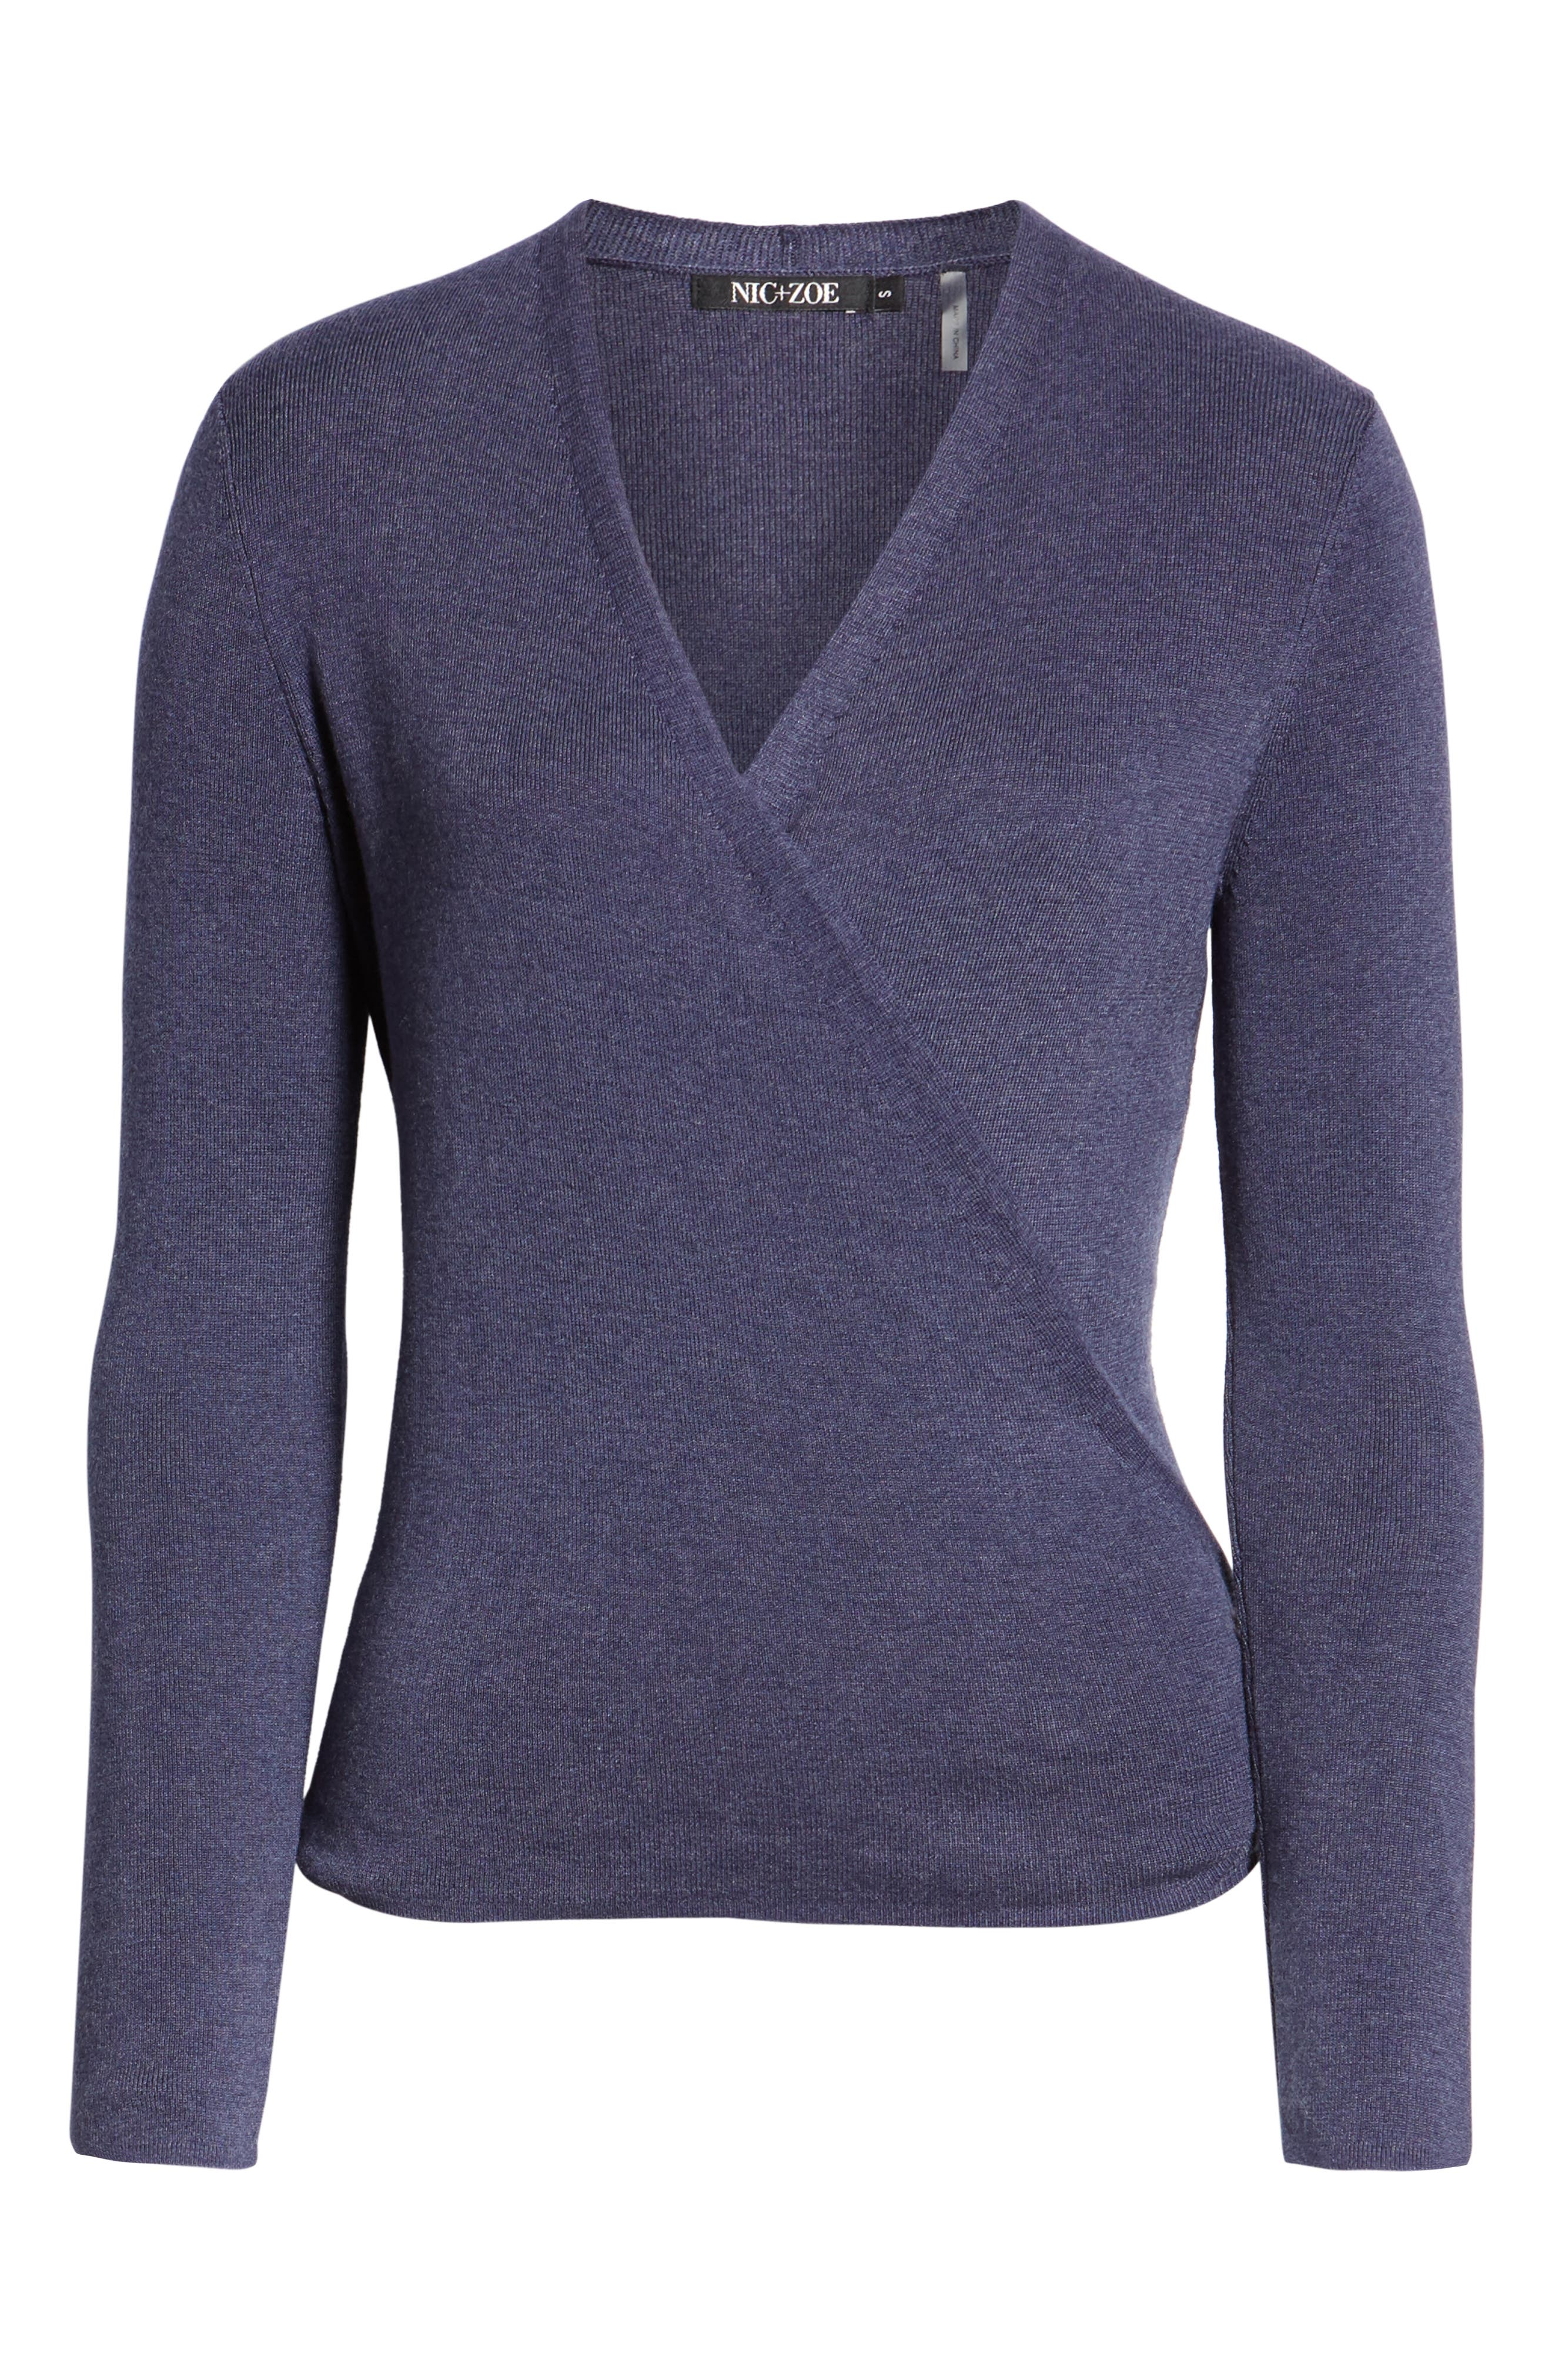 Women pink sweaters nordstrom jpg 2640x4048 Career women sweaters 79e85ae1e